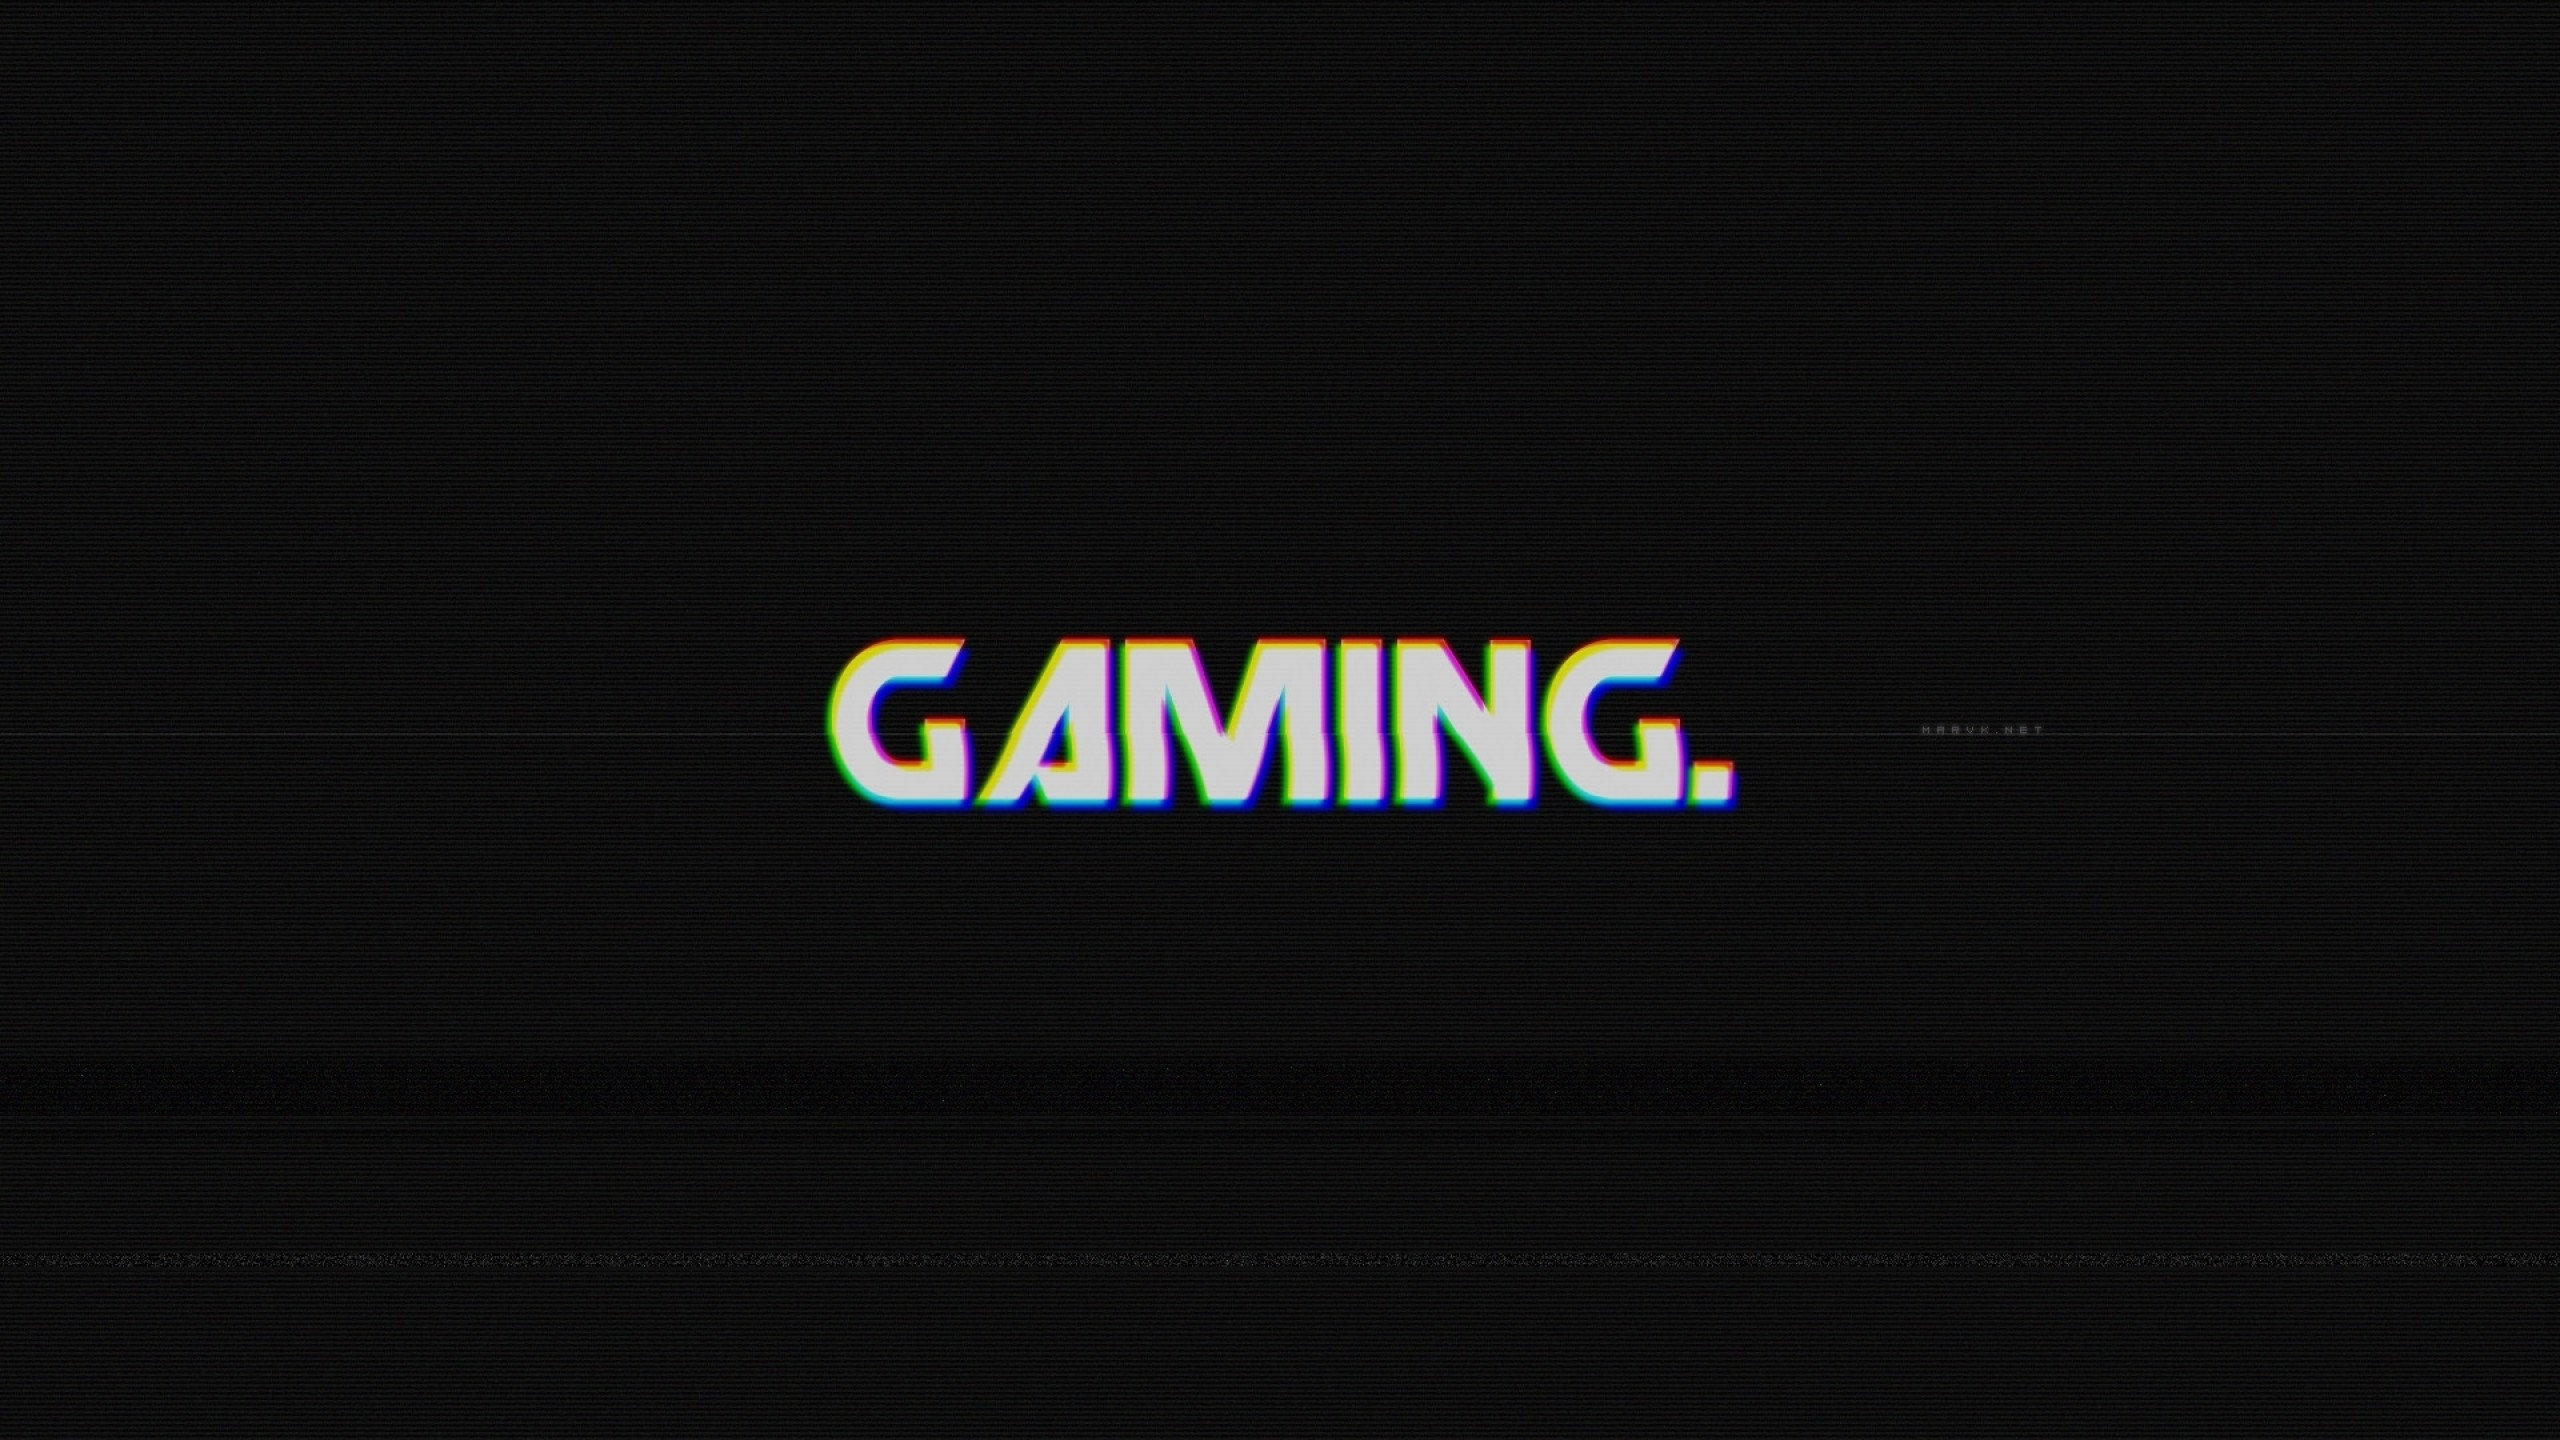 Gaming   HD Wallpaper 2560x1440 2560x1440